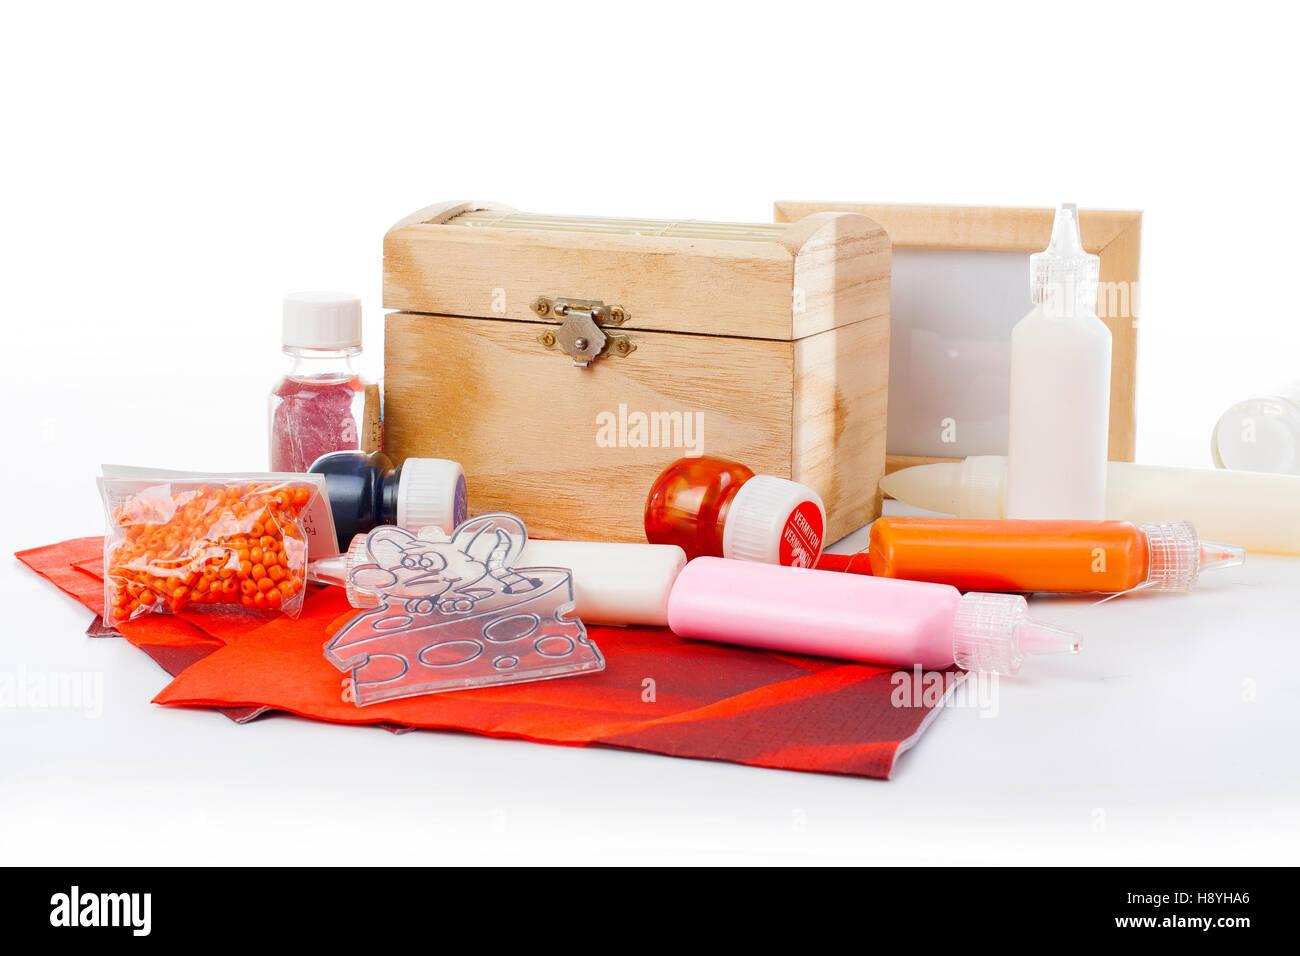 glass,glass paint,glue,decoupage glue,lacquer,decoupage lacquer,coating,lacquering,napkin,paper napkin,creative Stock Photo